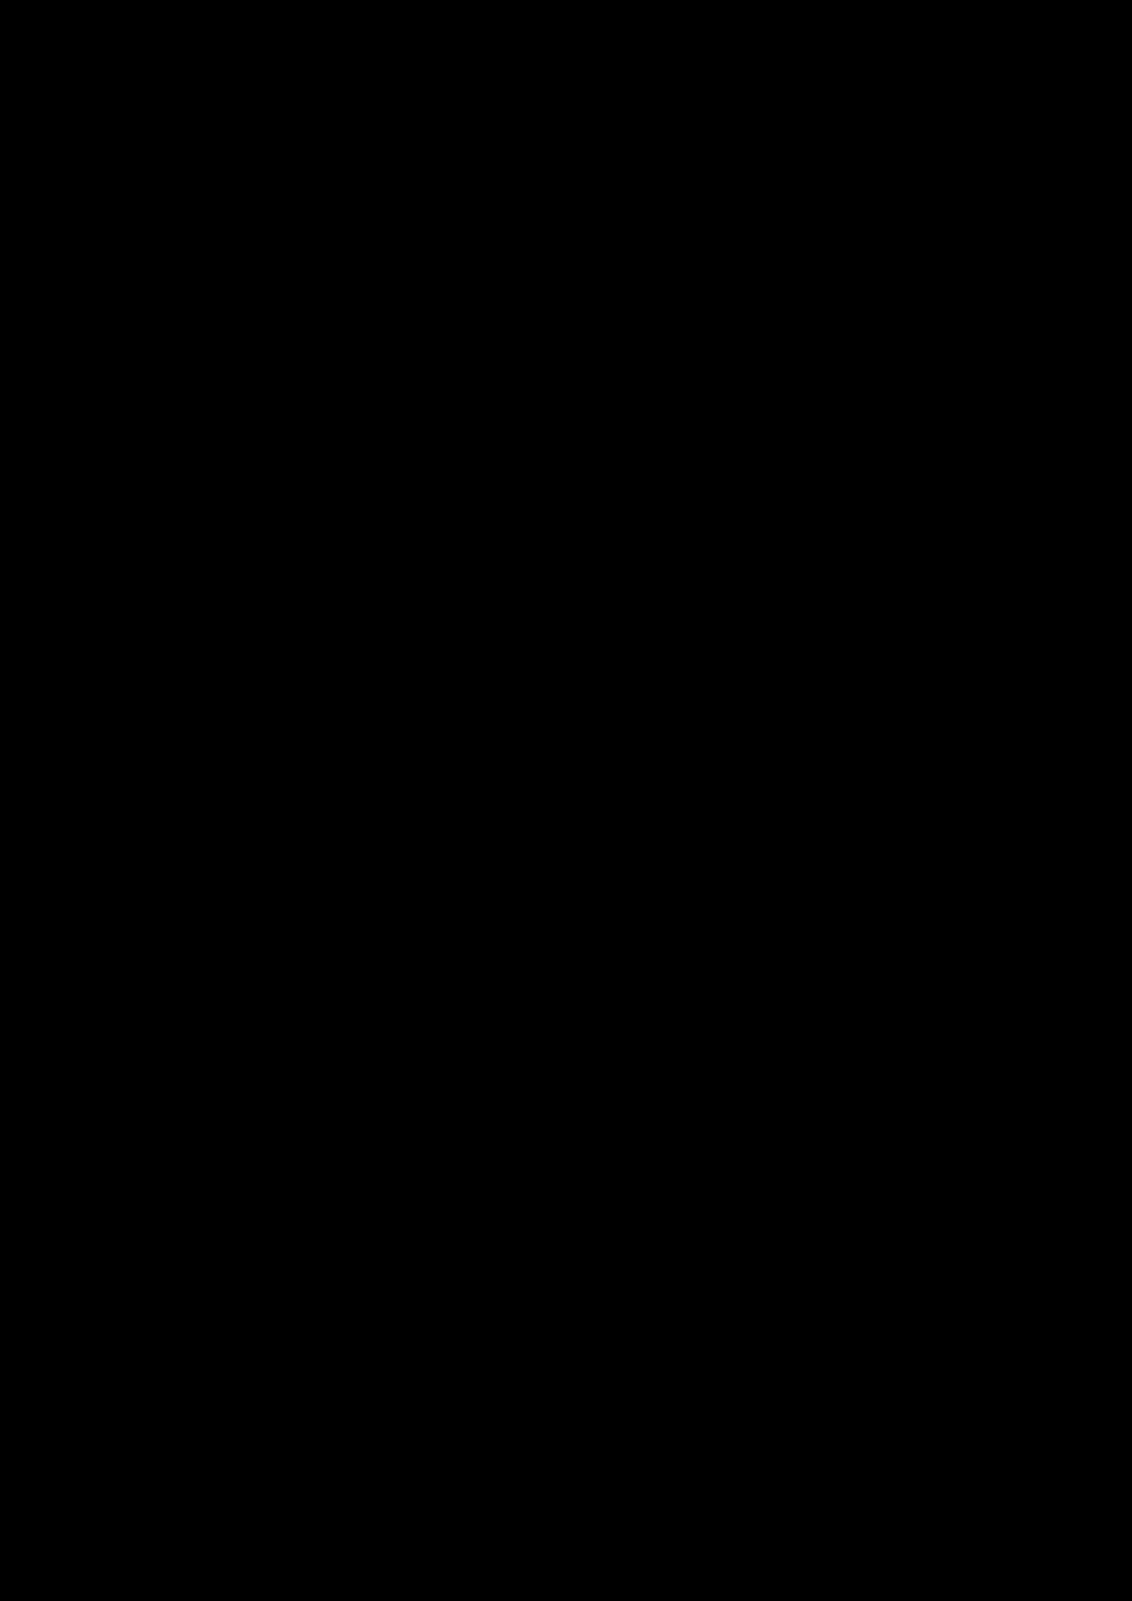 Ispoved Pervogo Boga slide, Image 71